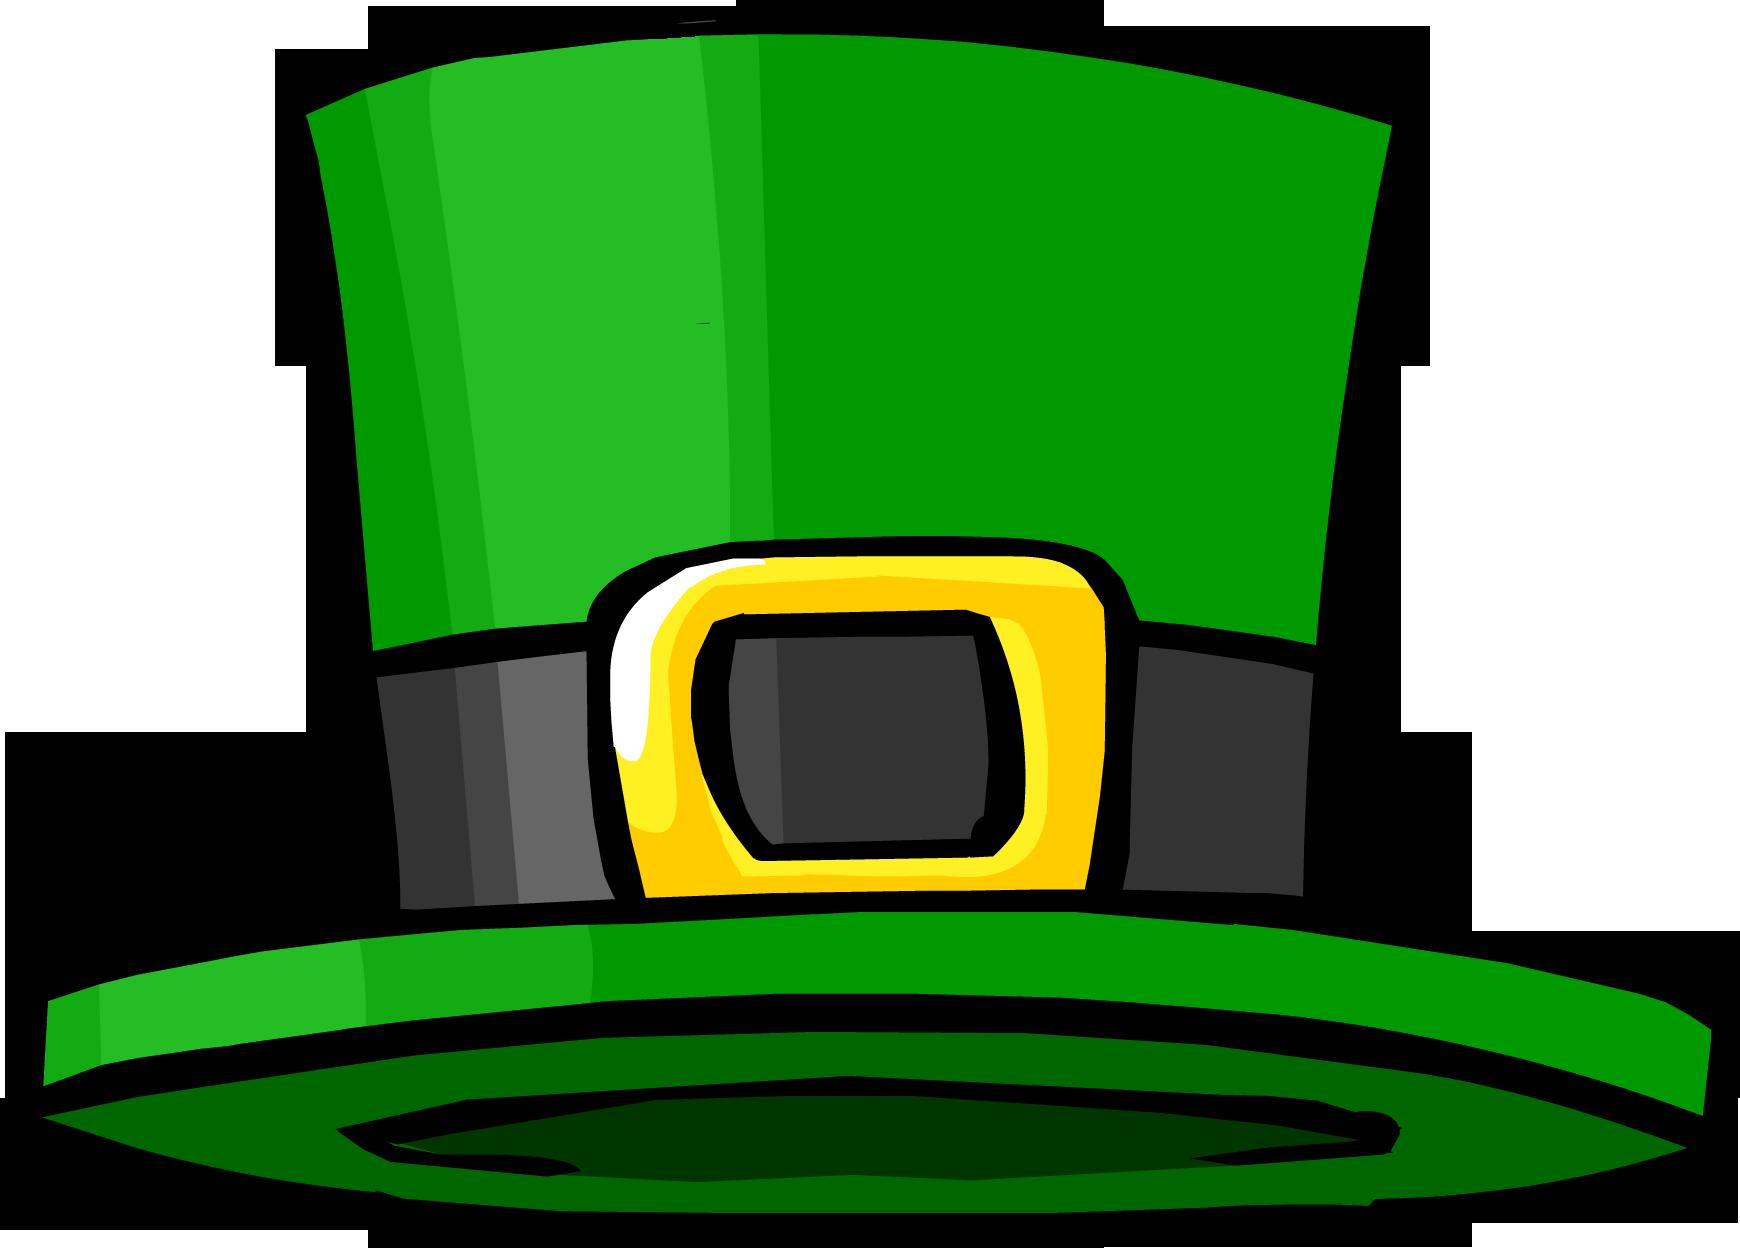 1740x1248 Gigantic St. Patrick's Hat Club Penguin Wiki Fandom Powered By